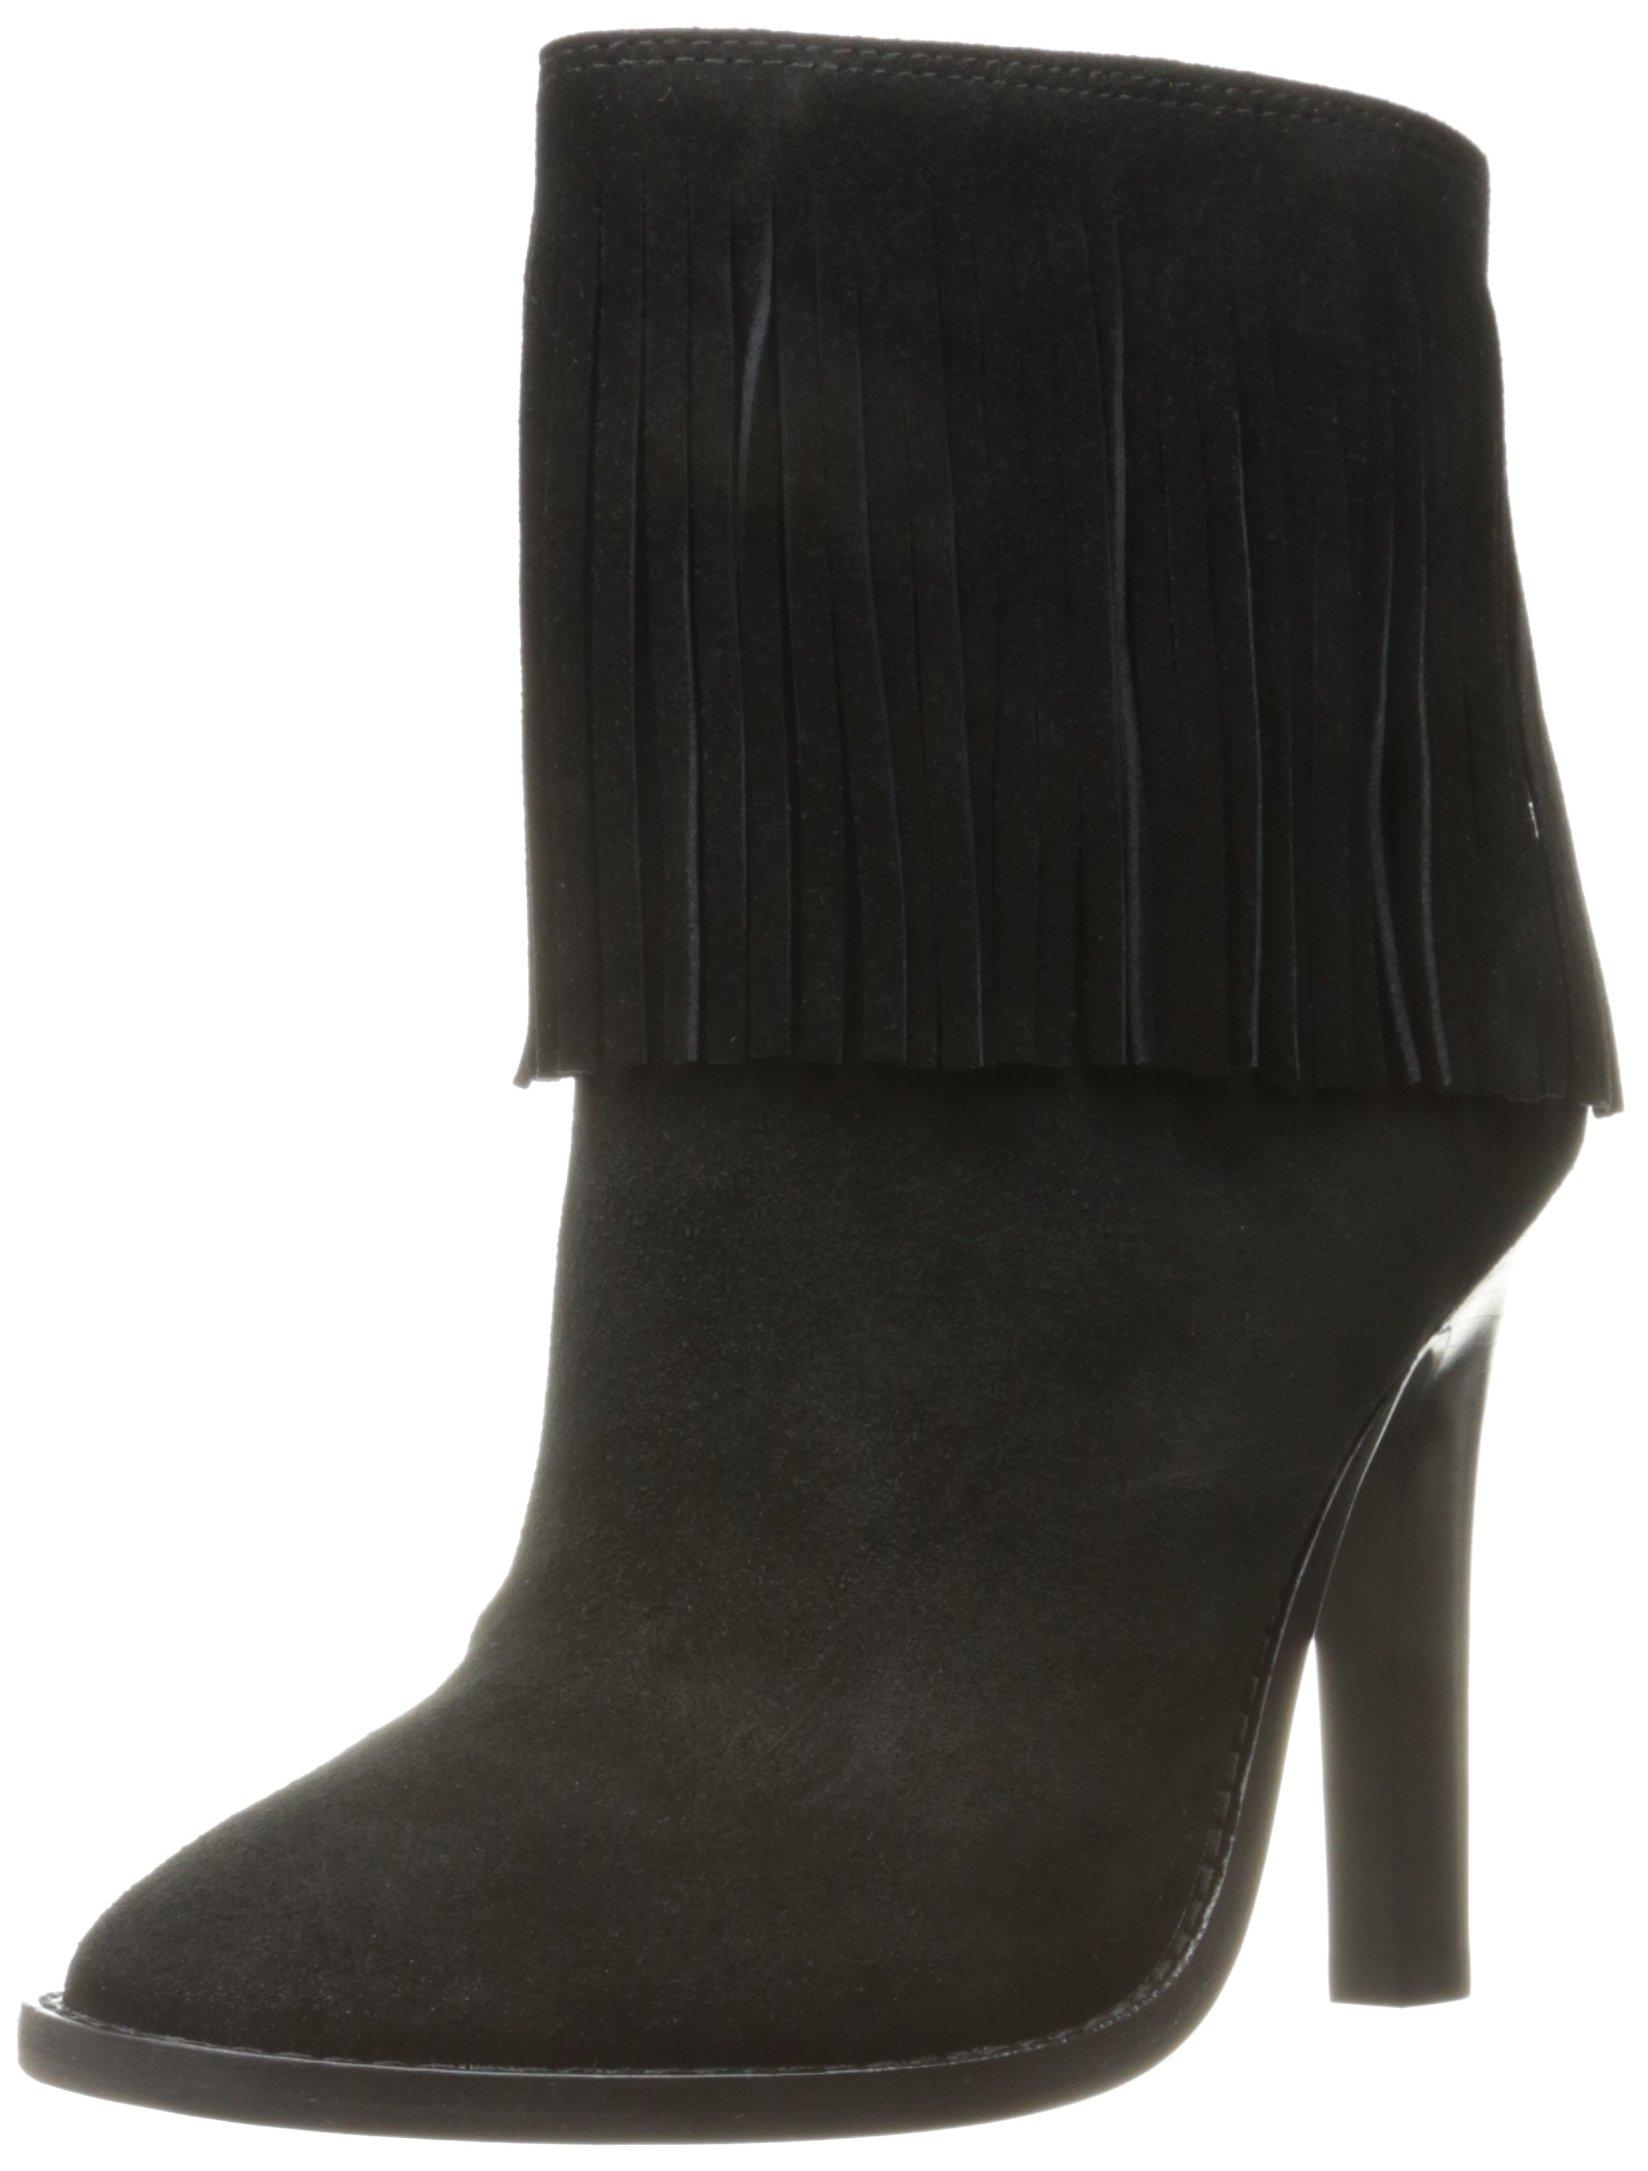 Joie Women's Cambrie Boot, Black-Suede, 36 EU/6 M US